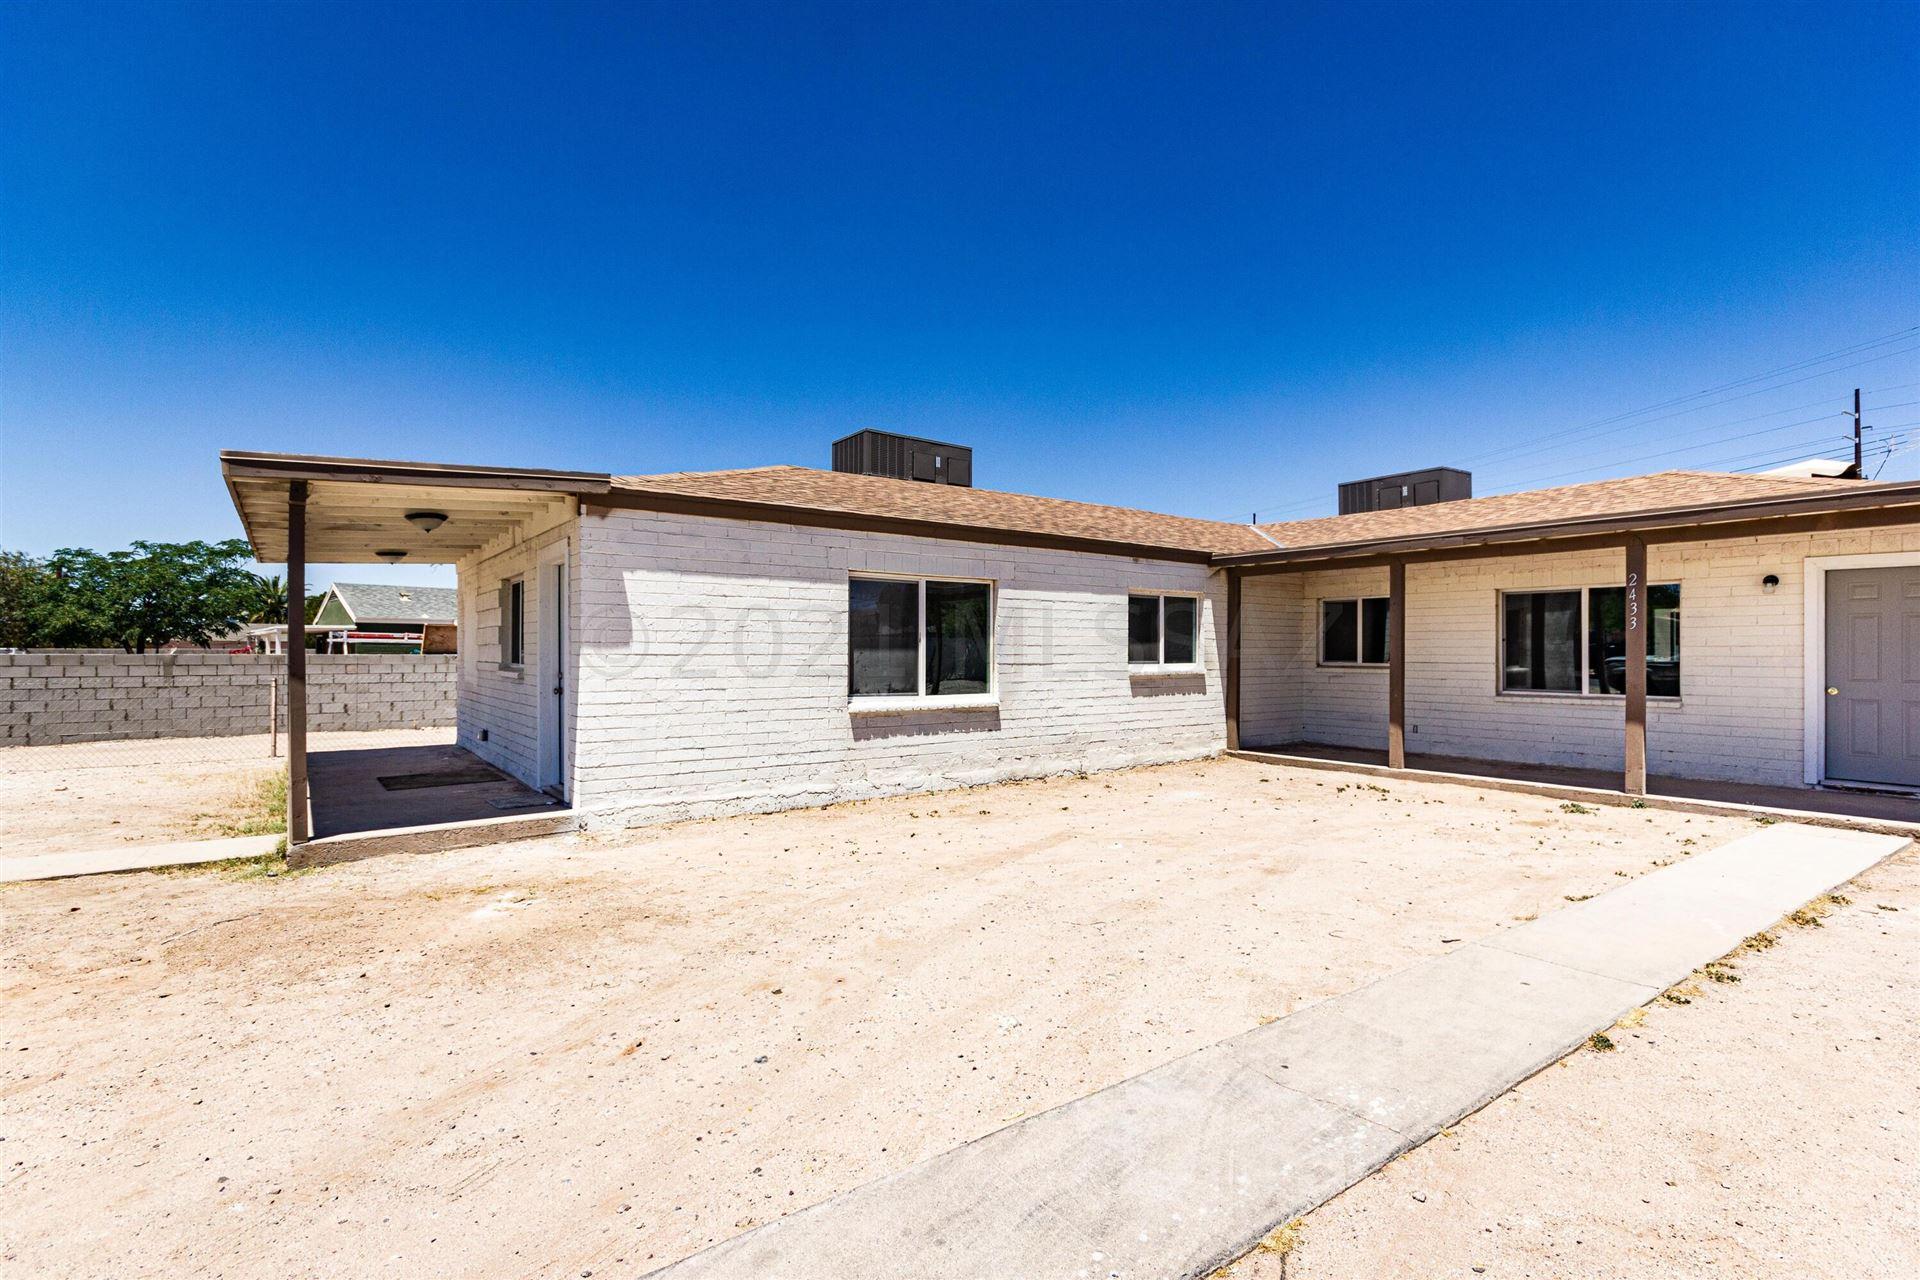 2433 E Cameron Vista, Tucson, AZ 85713 - MLS#: 22115989